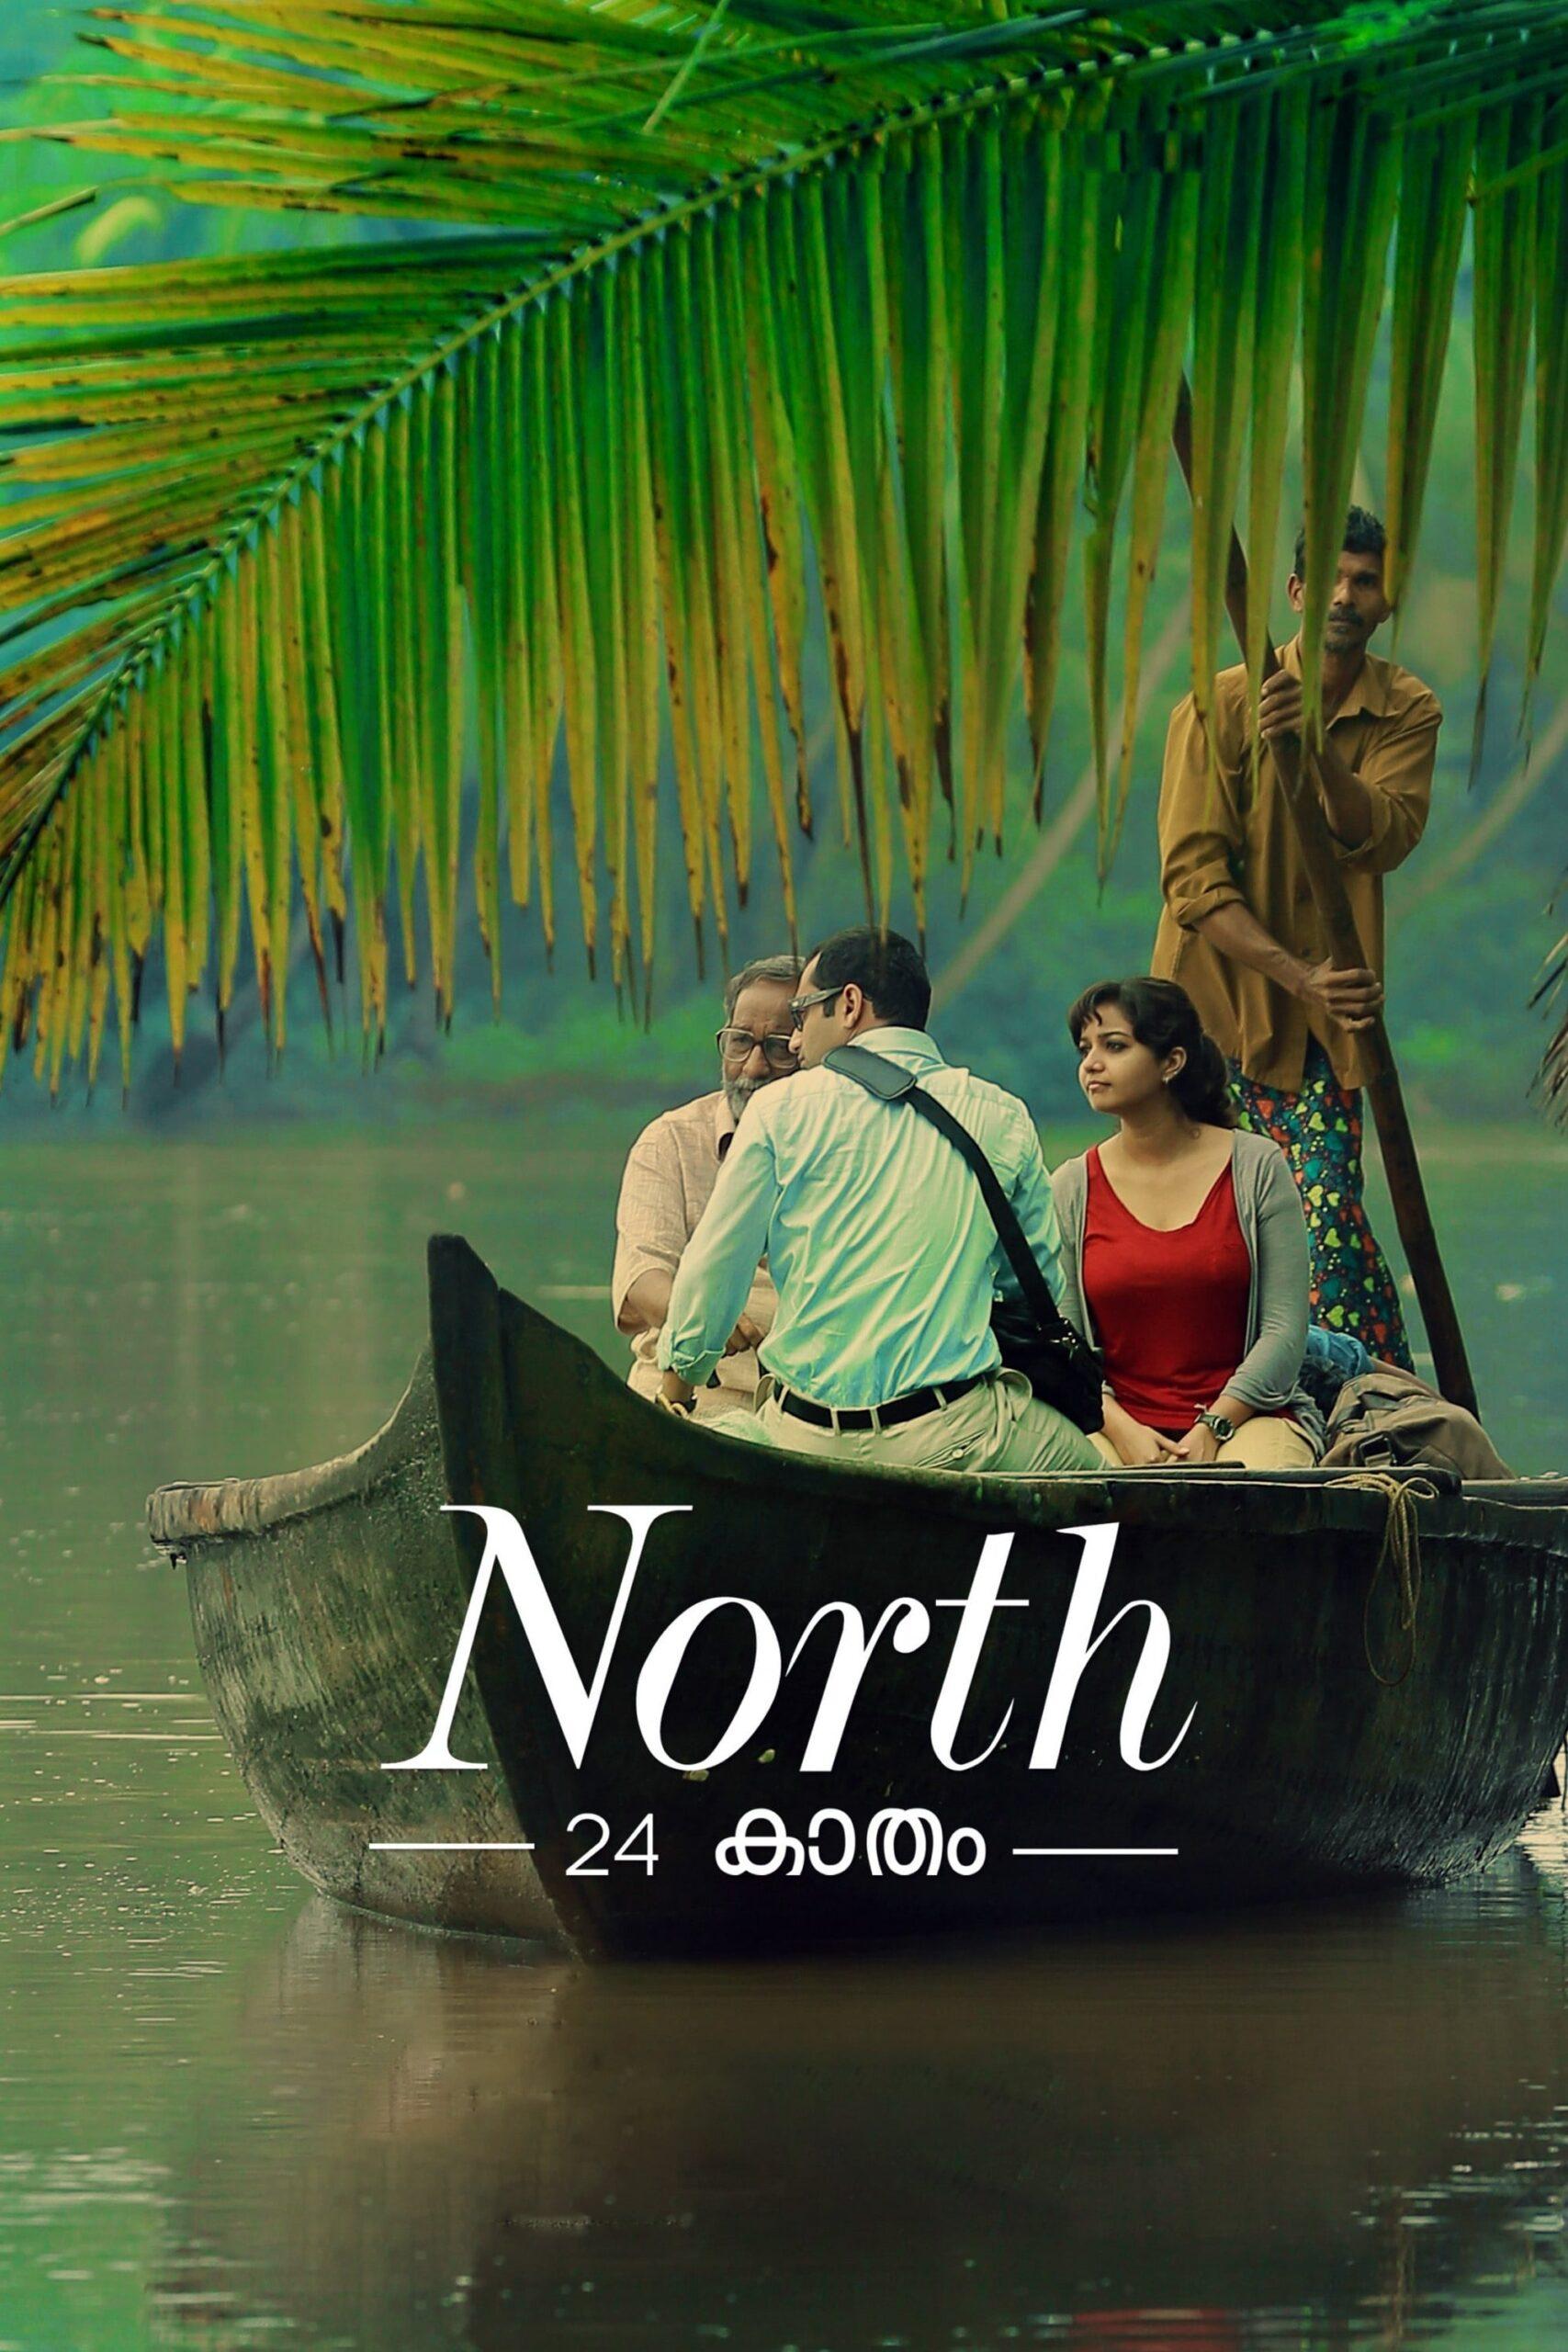 North 24 Kaatham Movie Streaming Online Watch on Disney Plus Hotstar, Google Play, Manorama MAX, Youtube